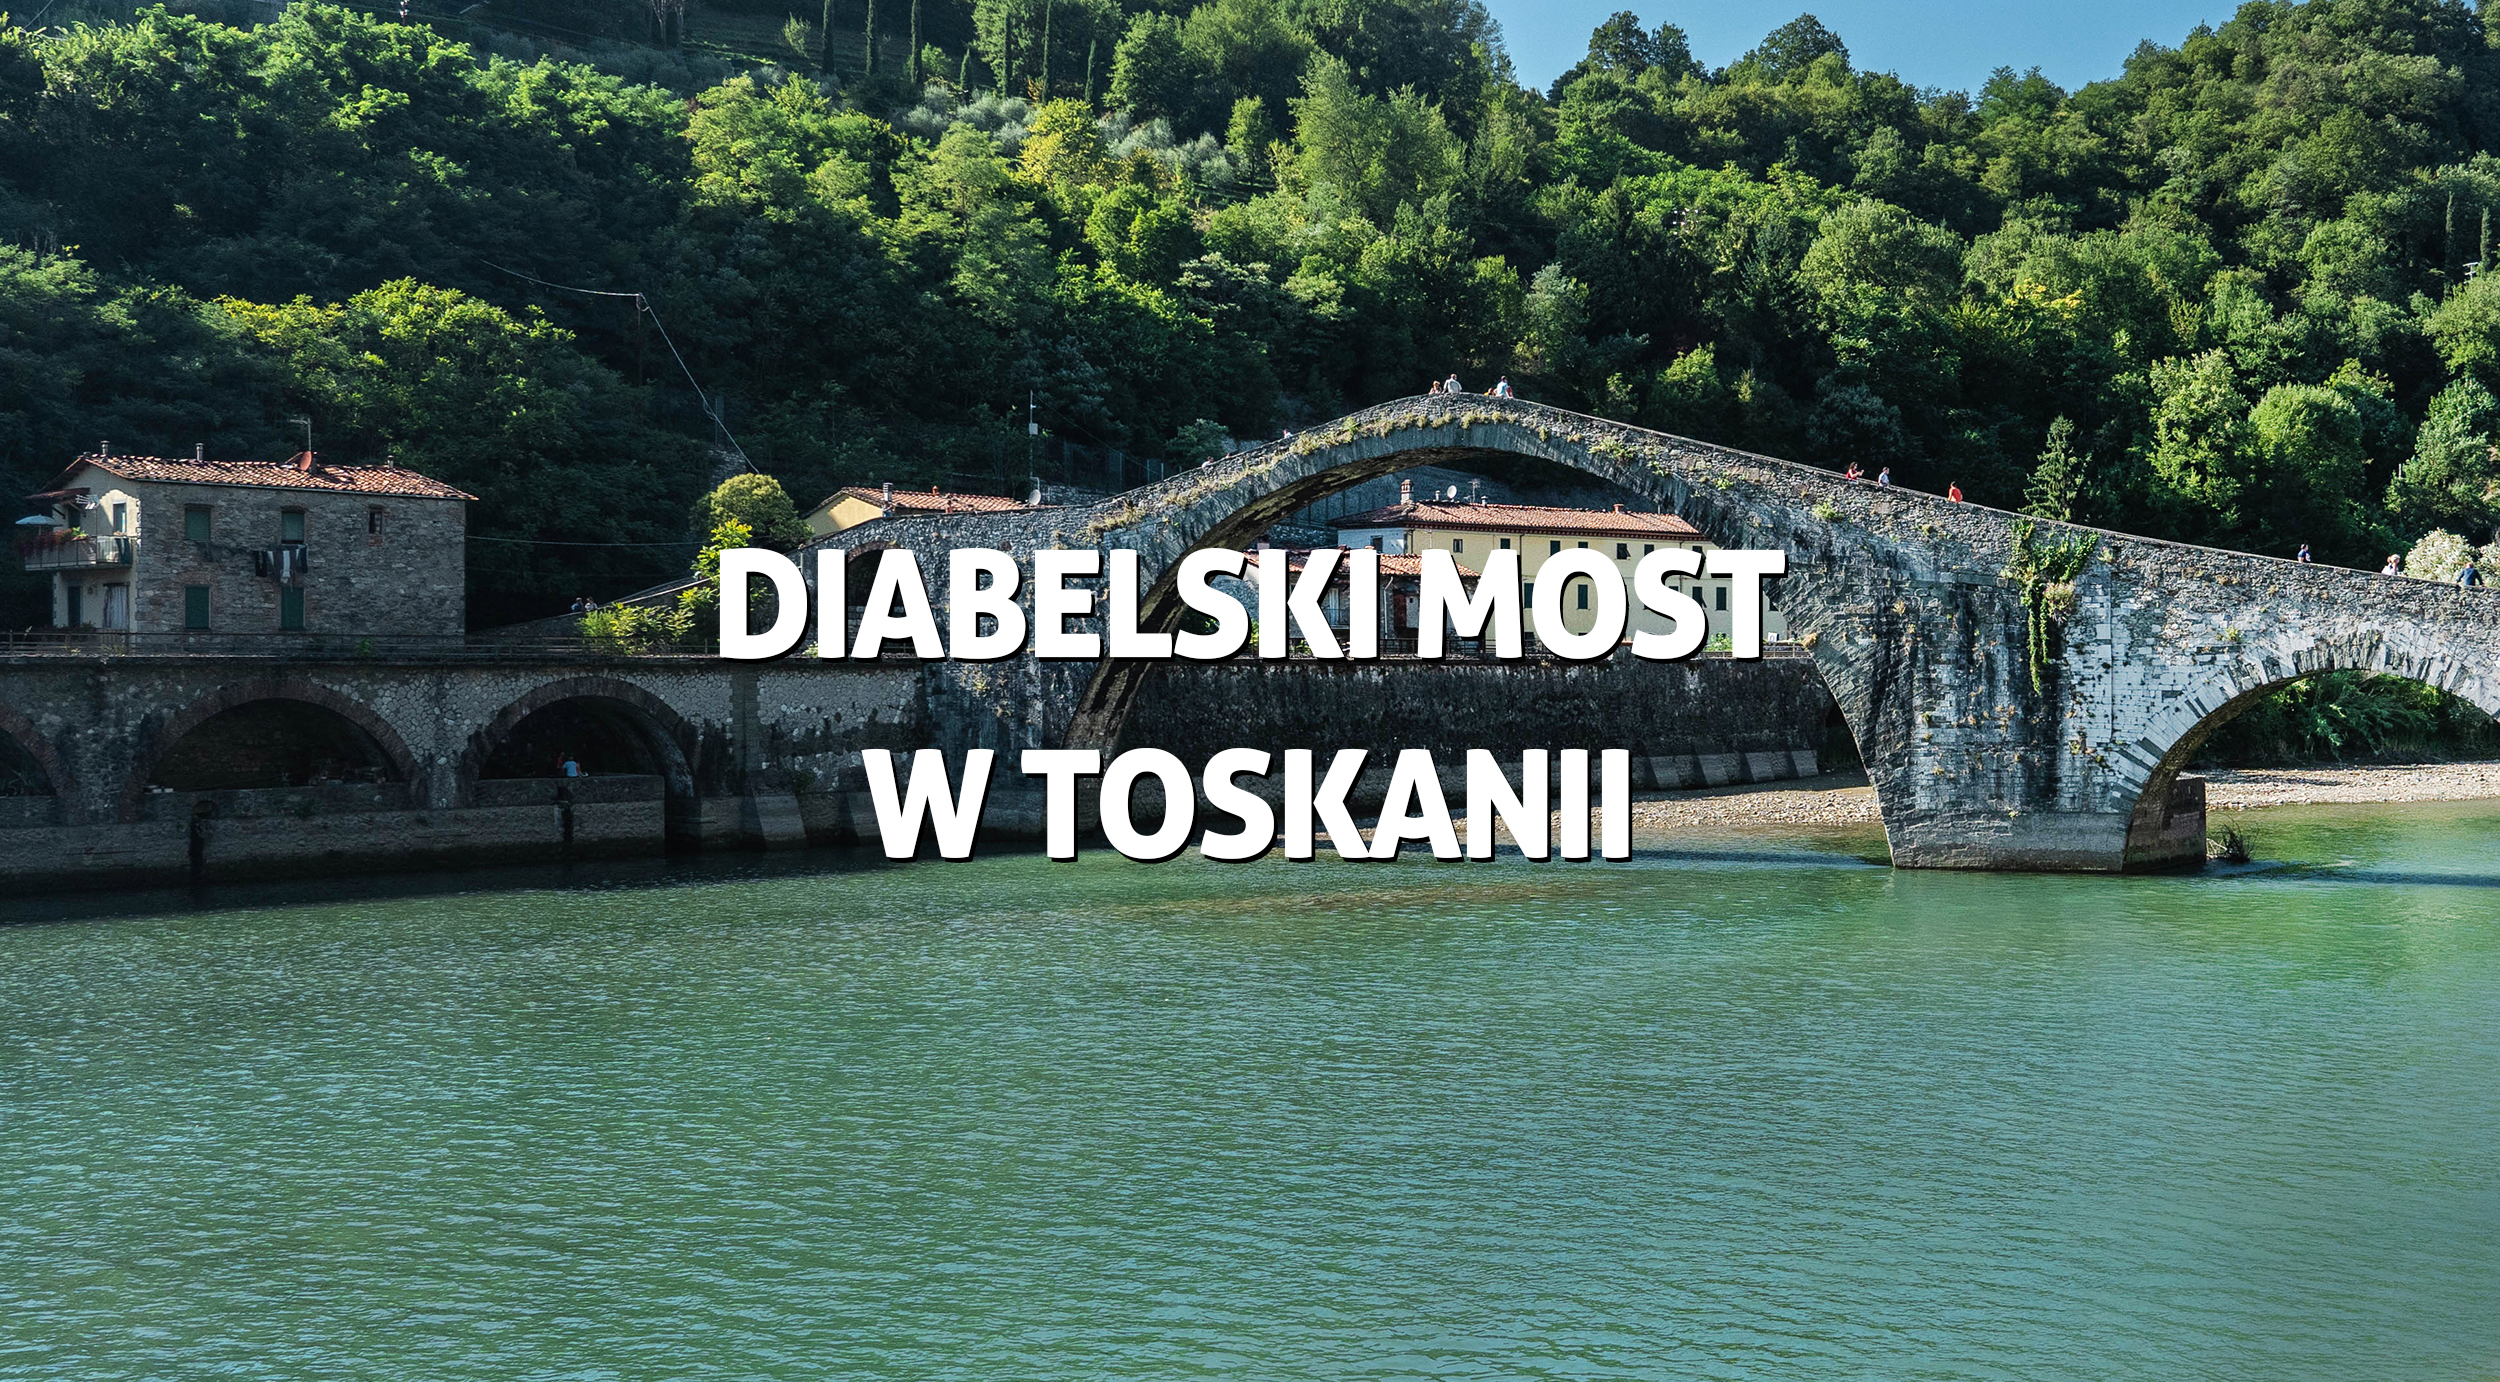 Diabelski most w Toskanii - Ponte del diavolo